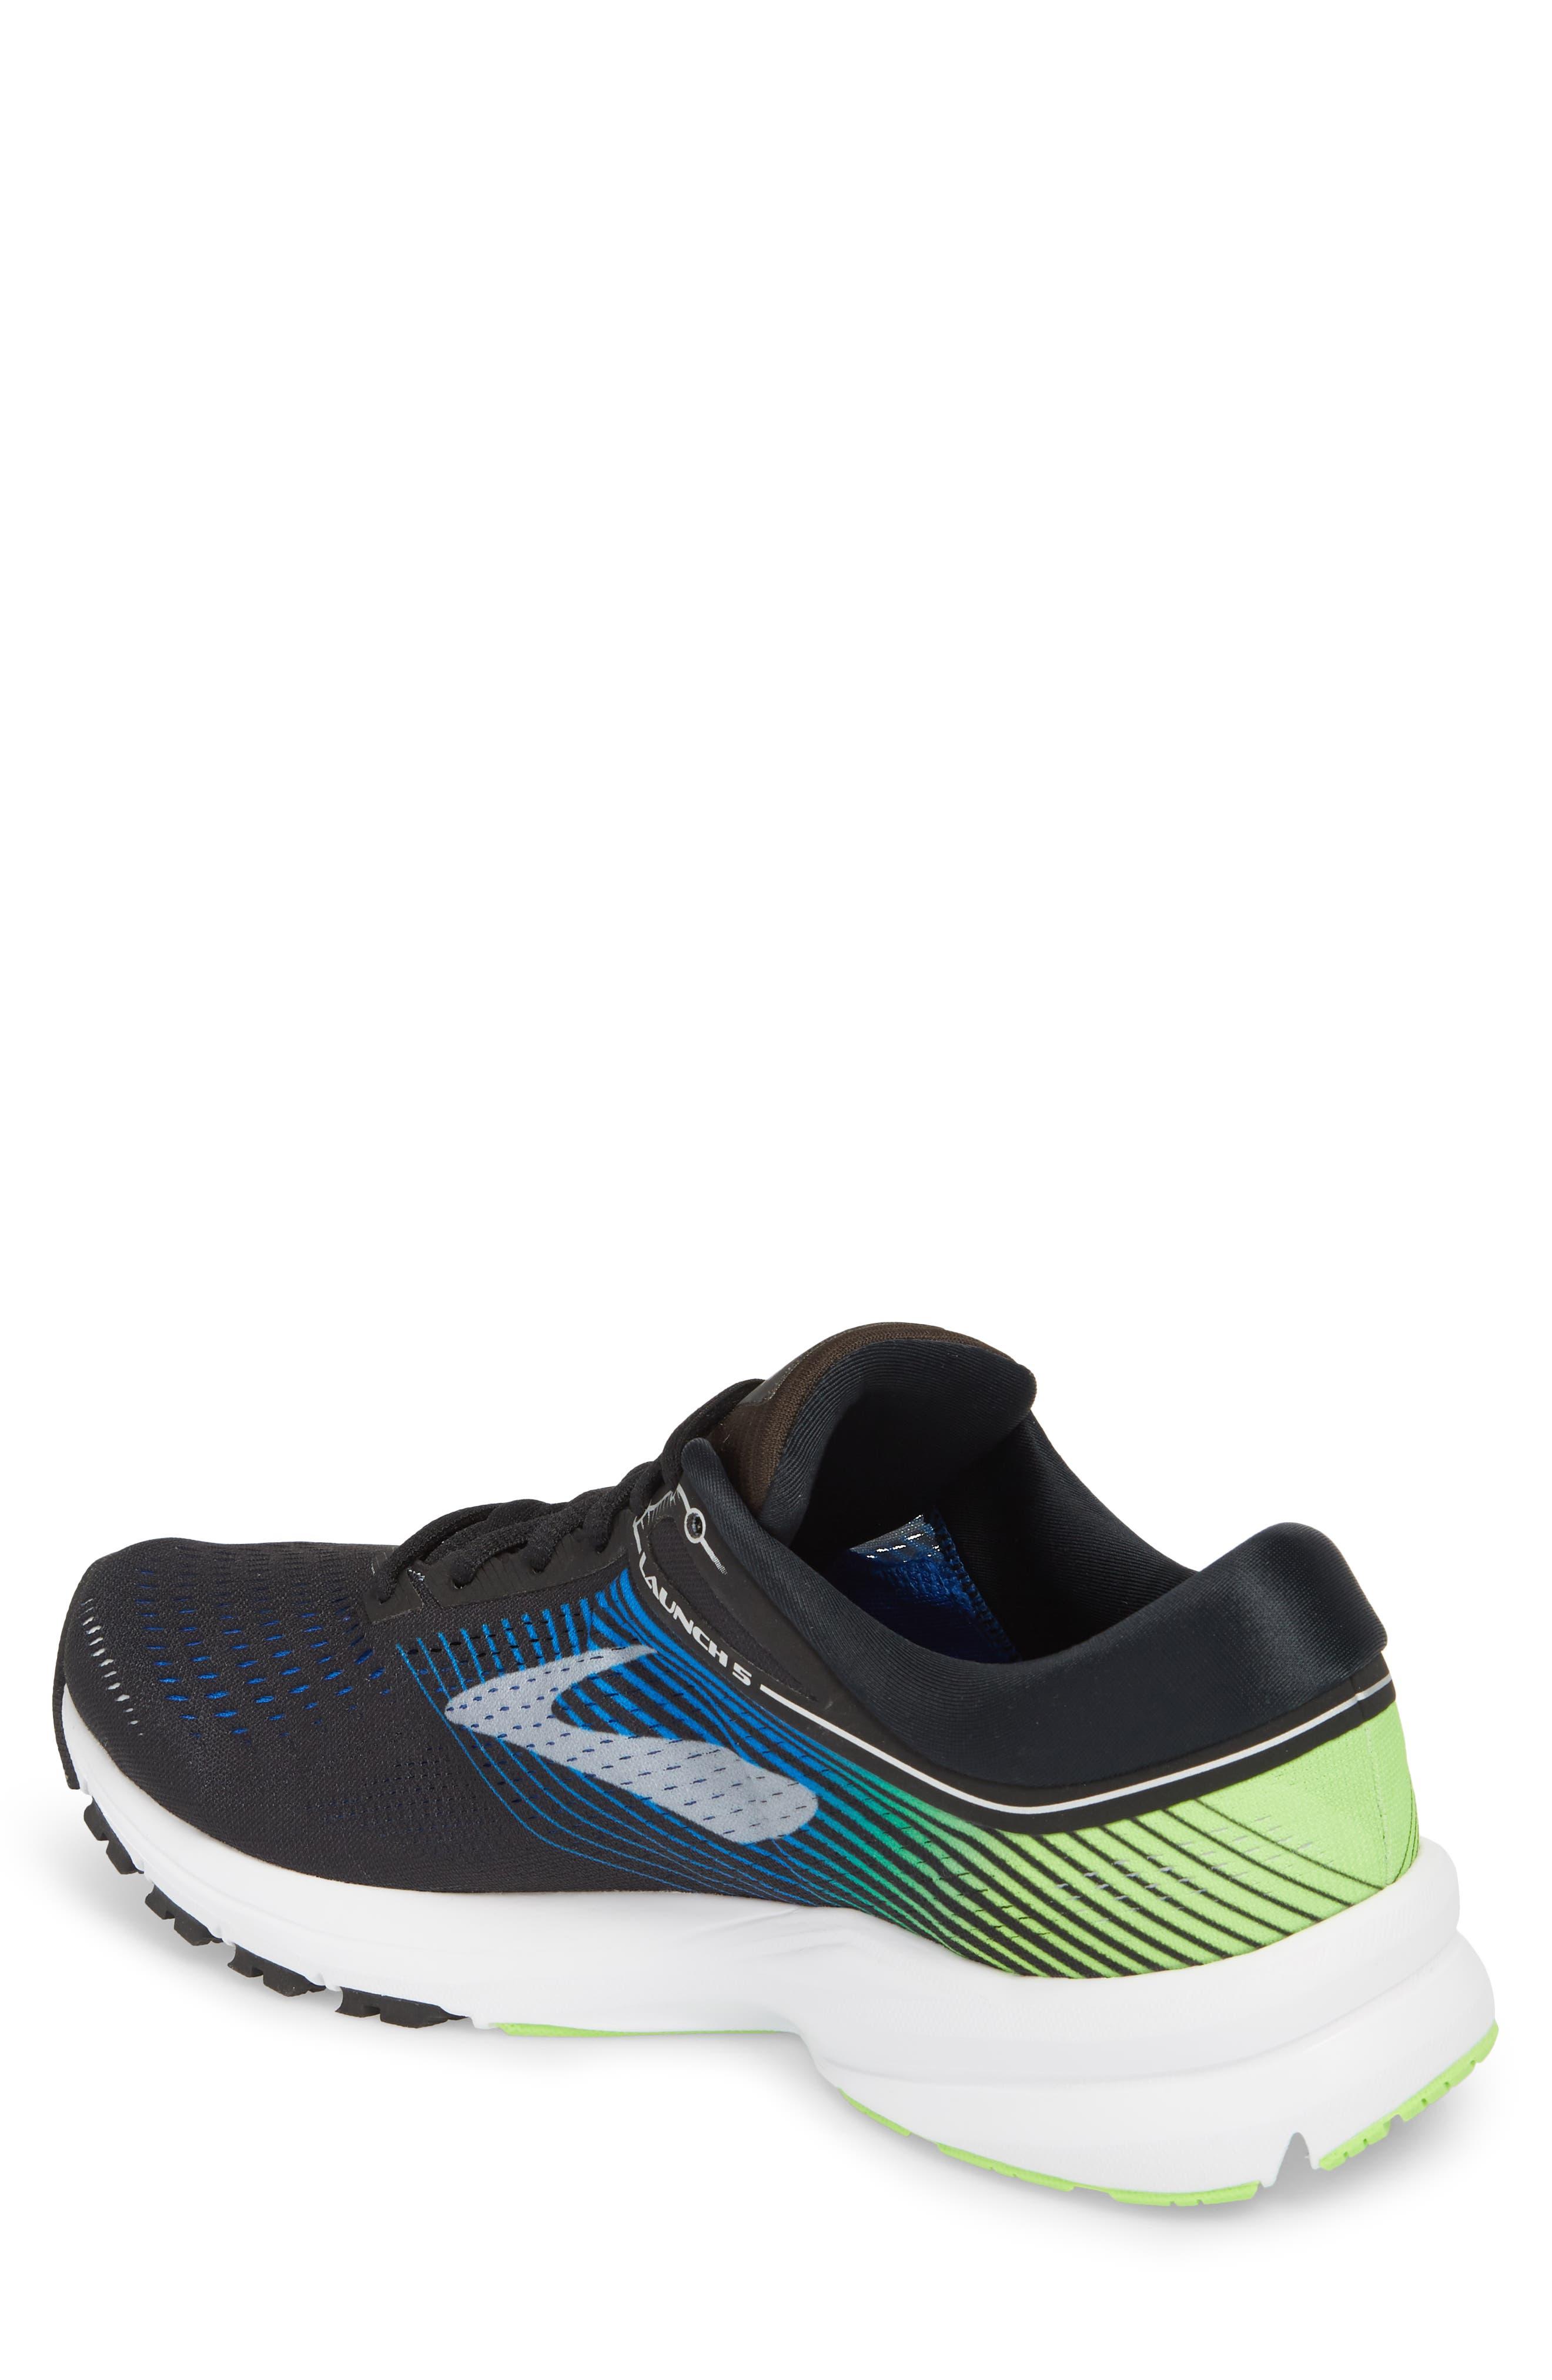 Launch 5 Running Shoe,                             Alternate thumbnail 2, color,                             Black/ Blue/ Green